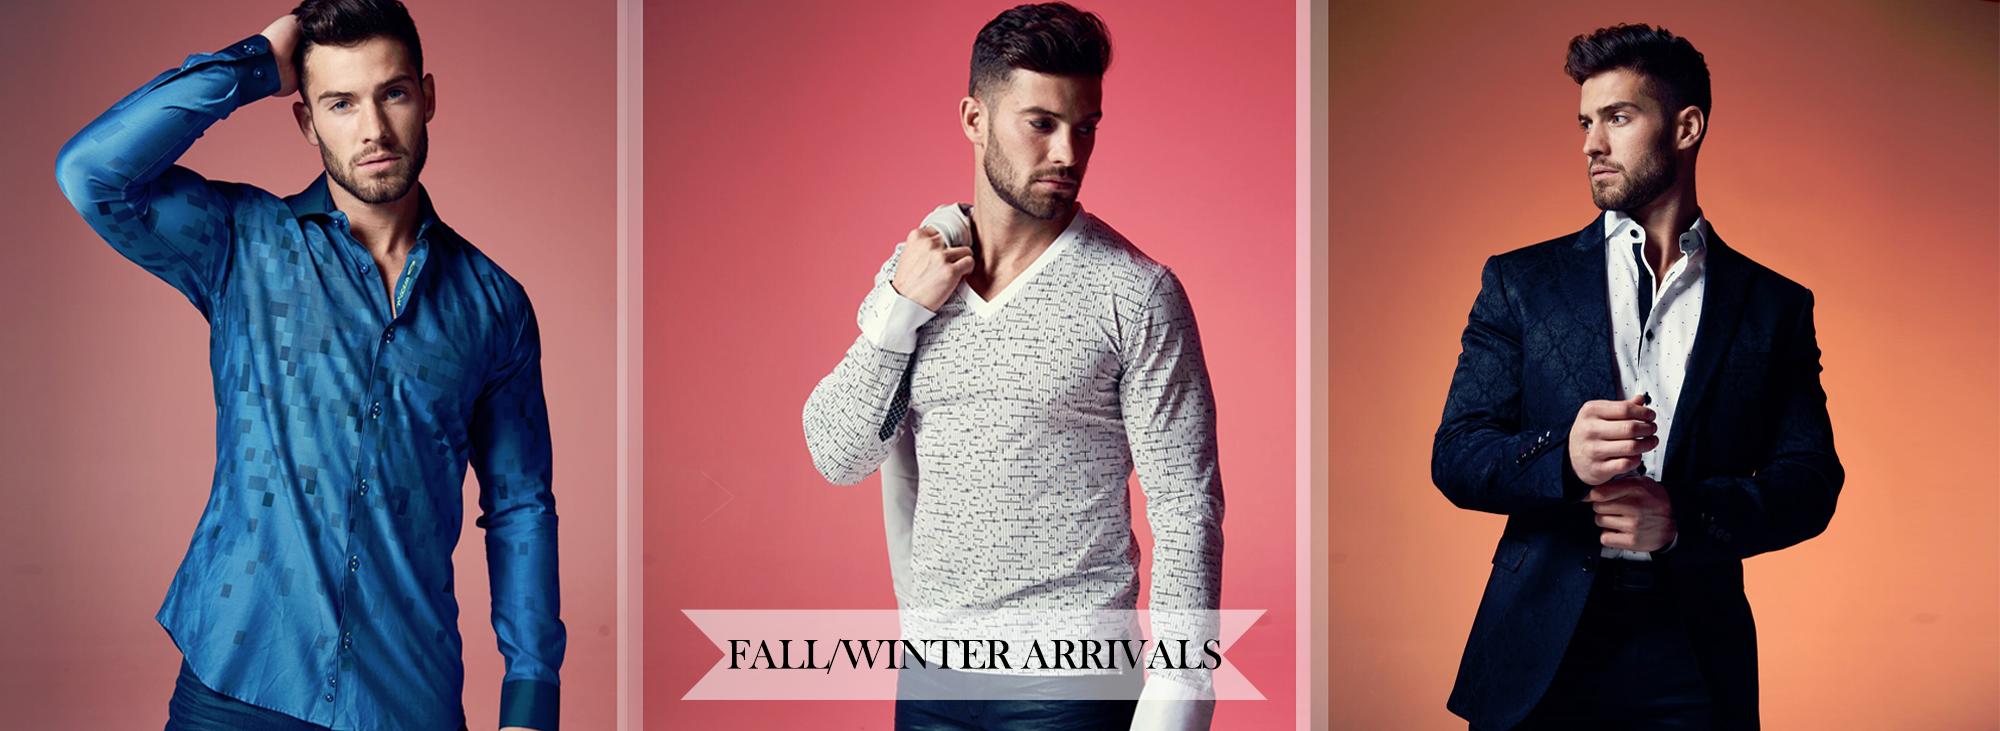 Men fashion clothing